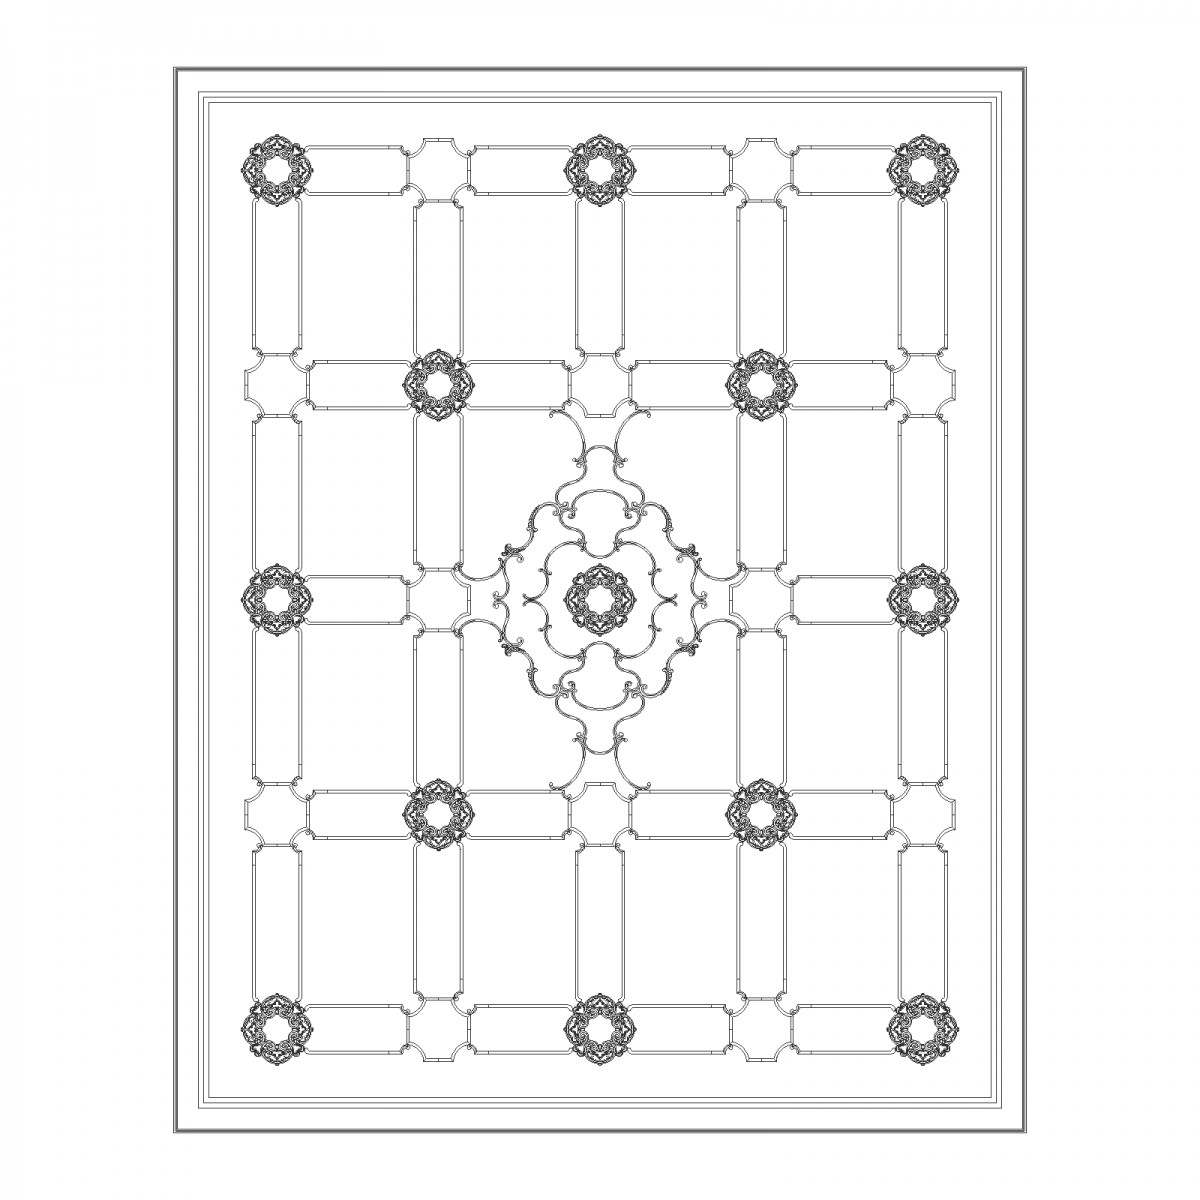 Потолок RODECOR Пагода Ф3 88033CN